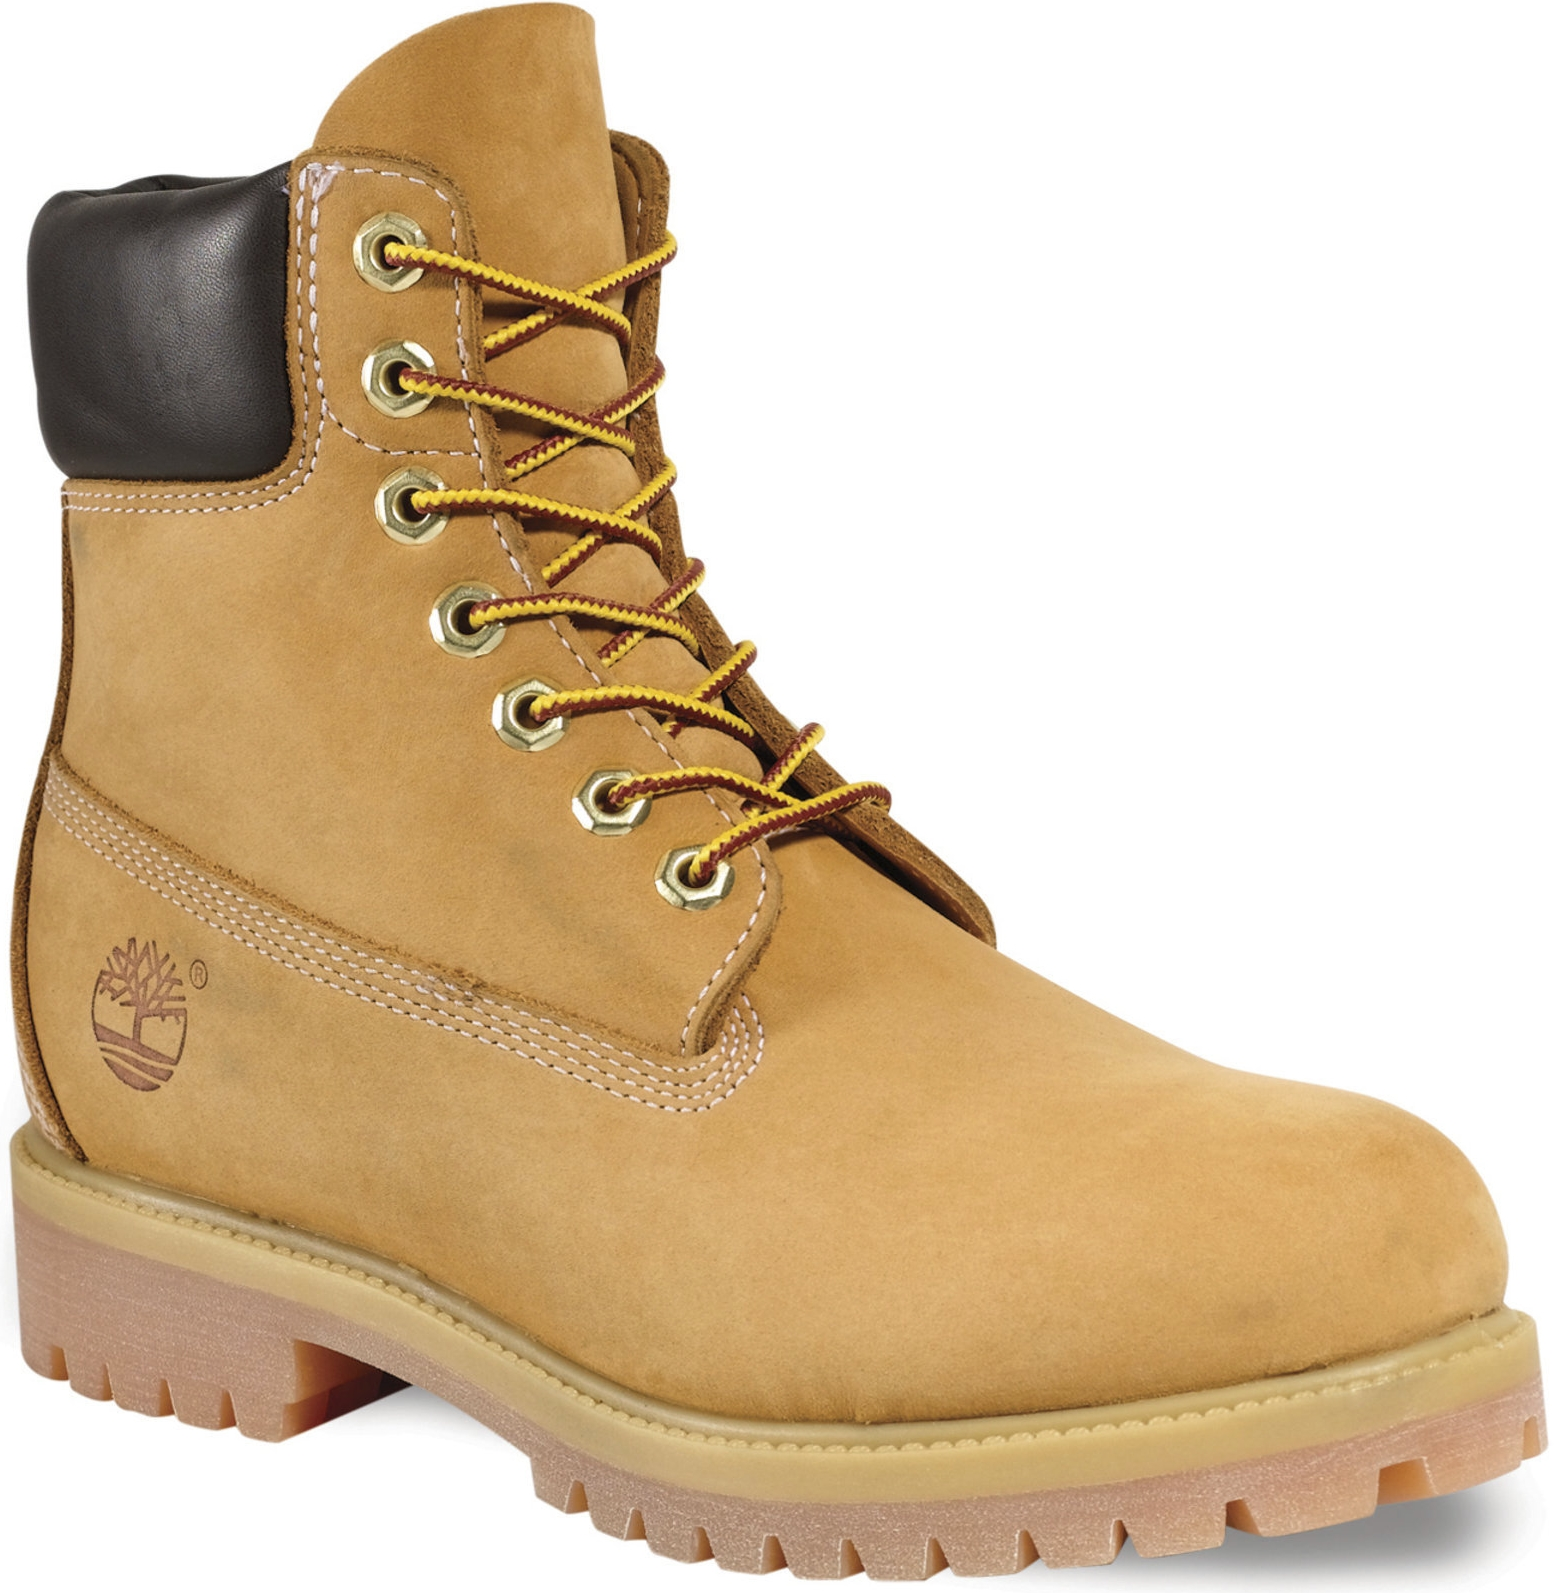 Timberland 6-inch Premium Waterproof Boots, $190